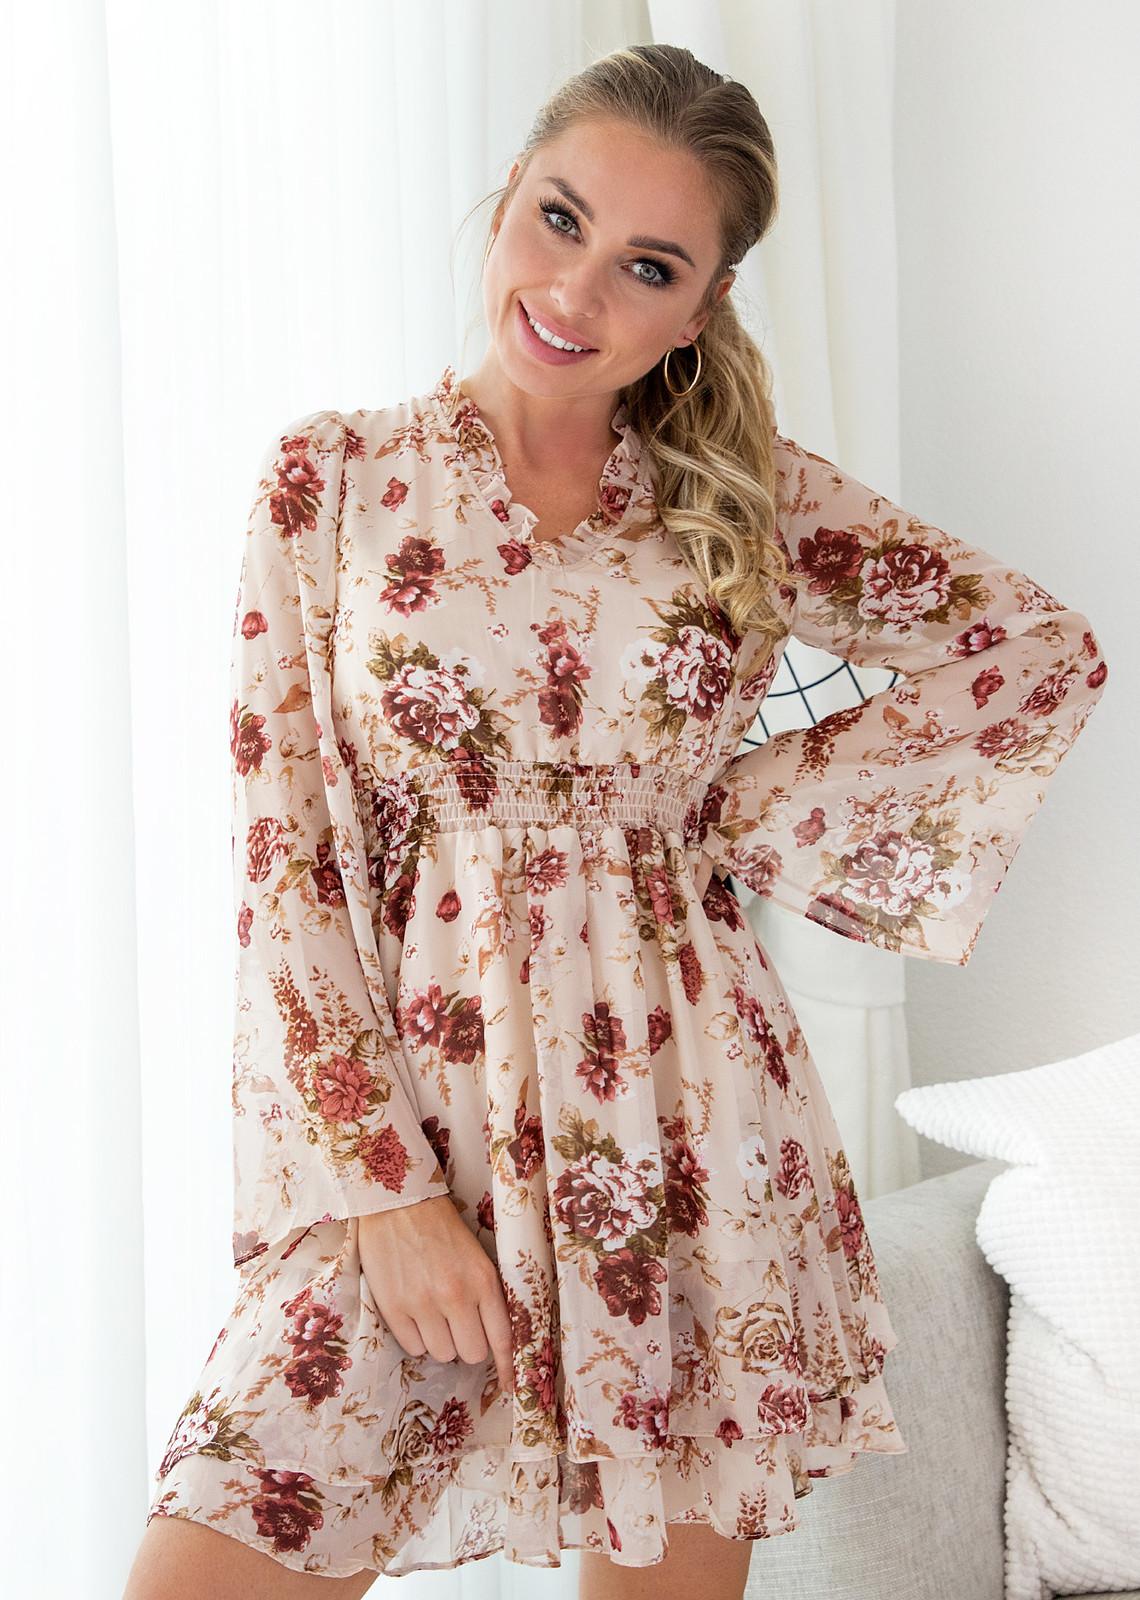 Flower dress Arline